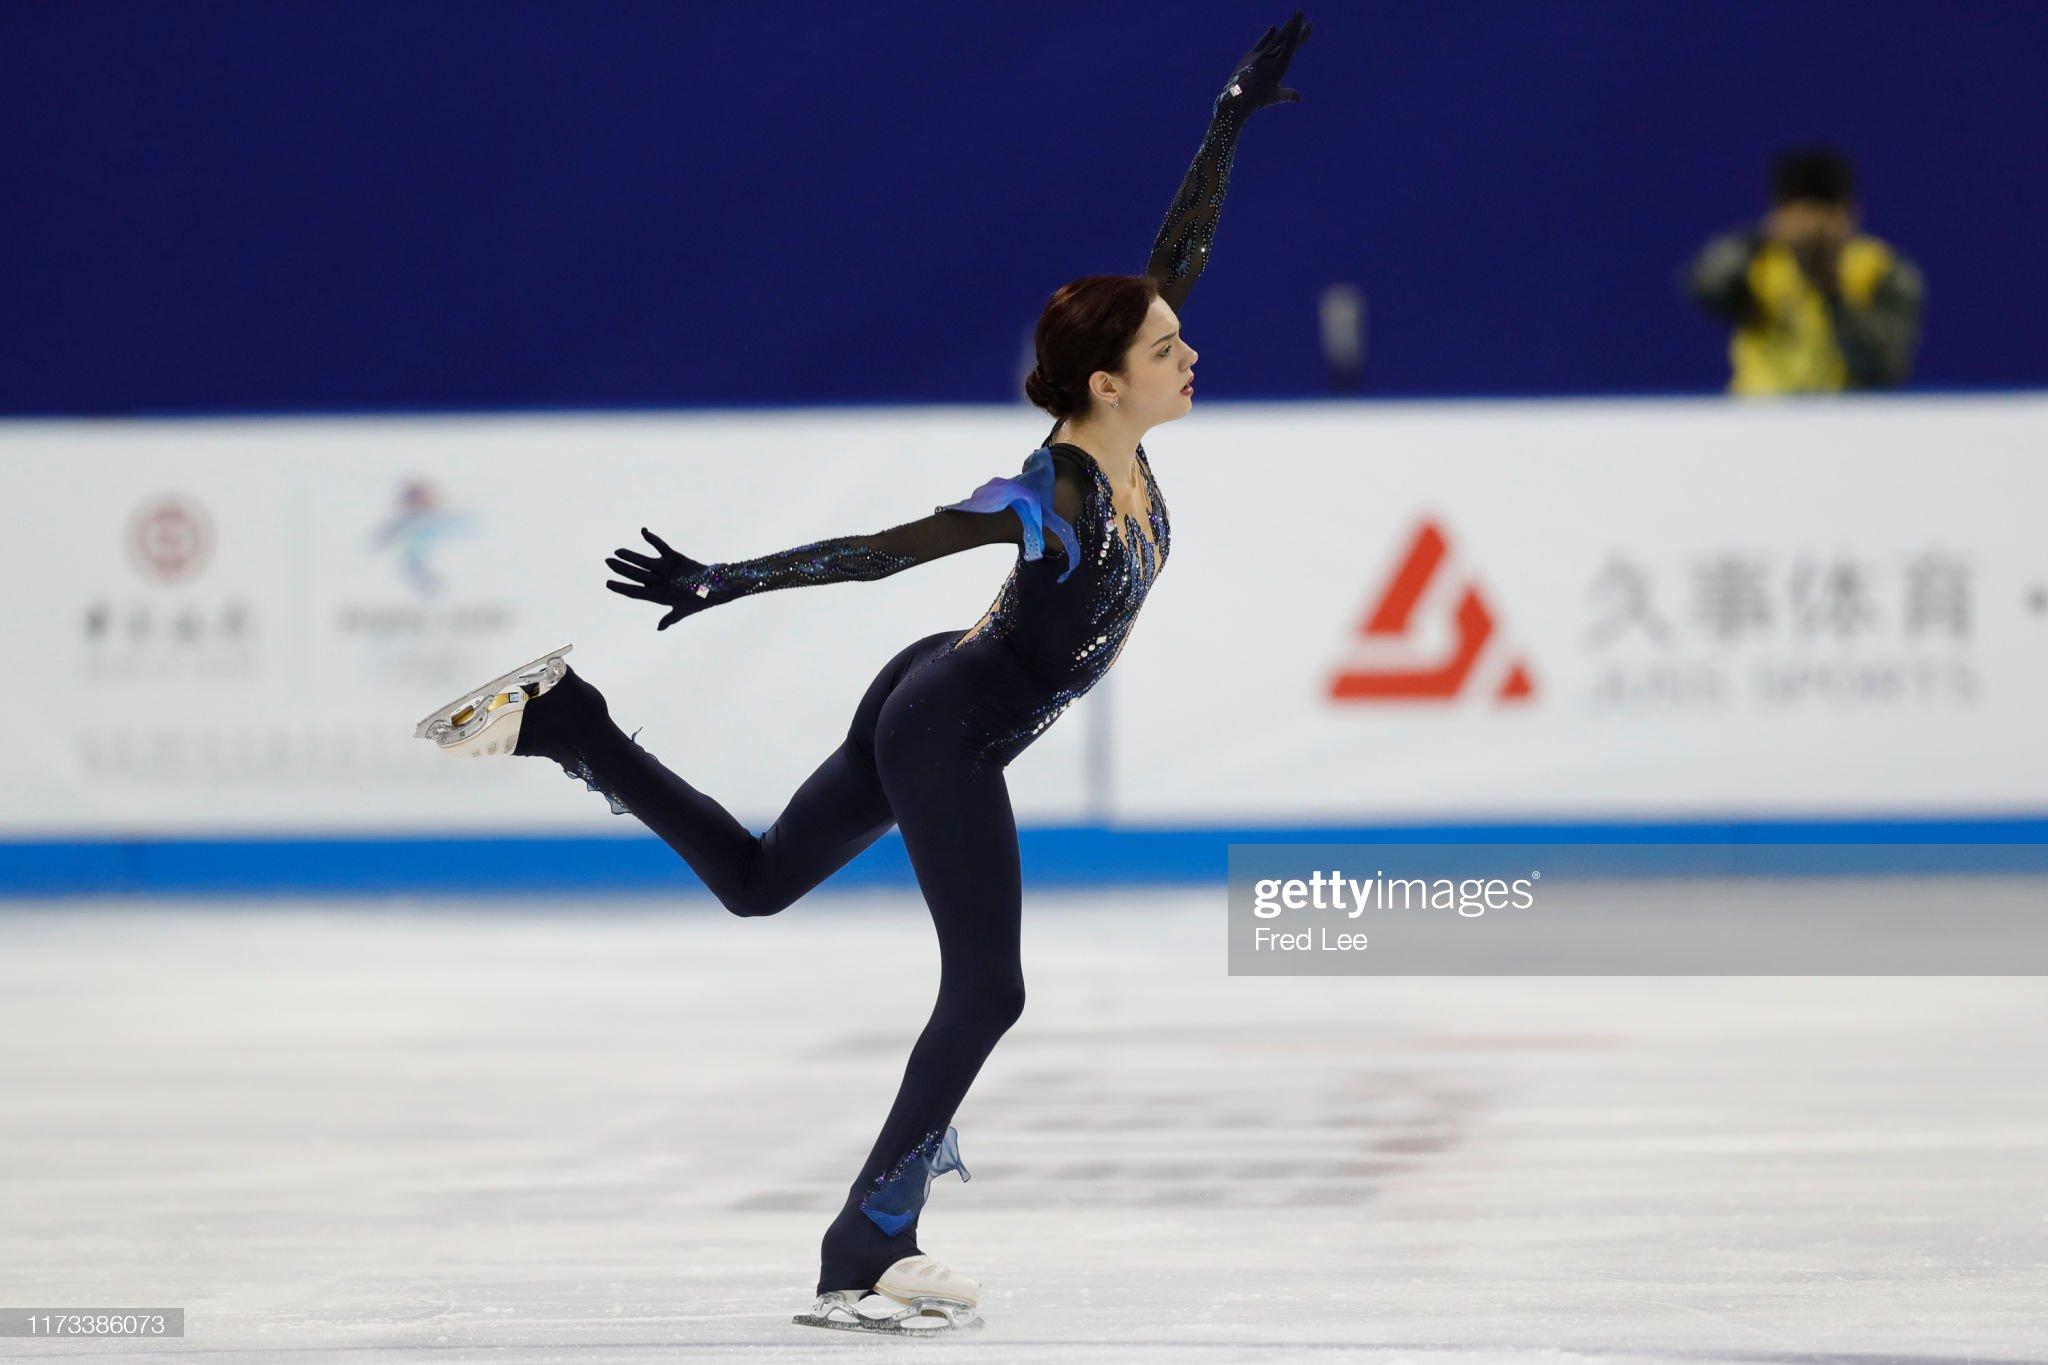 Shanghai Trophy (Invitational). 3-5 октября 2019. Шанхай (Китай) - Страница 3 Evgenia-medvedeva-of-russia-performs-in-the-ladies-short-program-the-picture-id1173386073?s=2048x2048